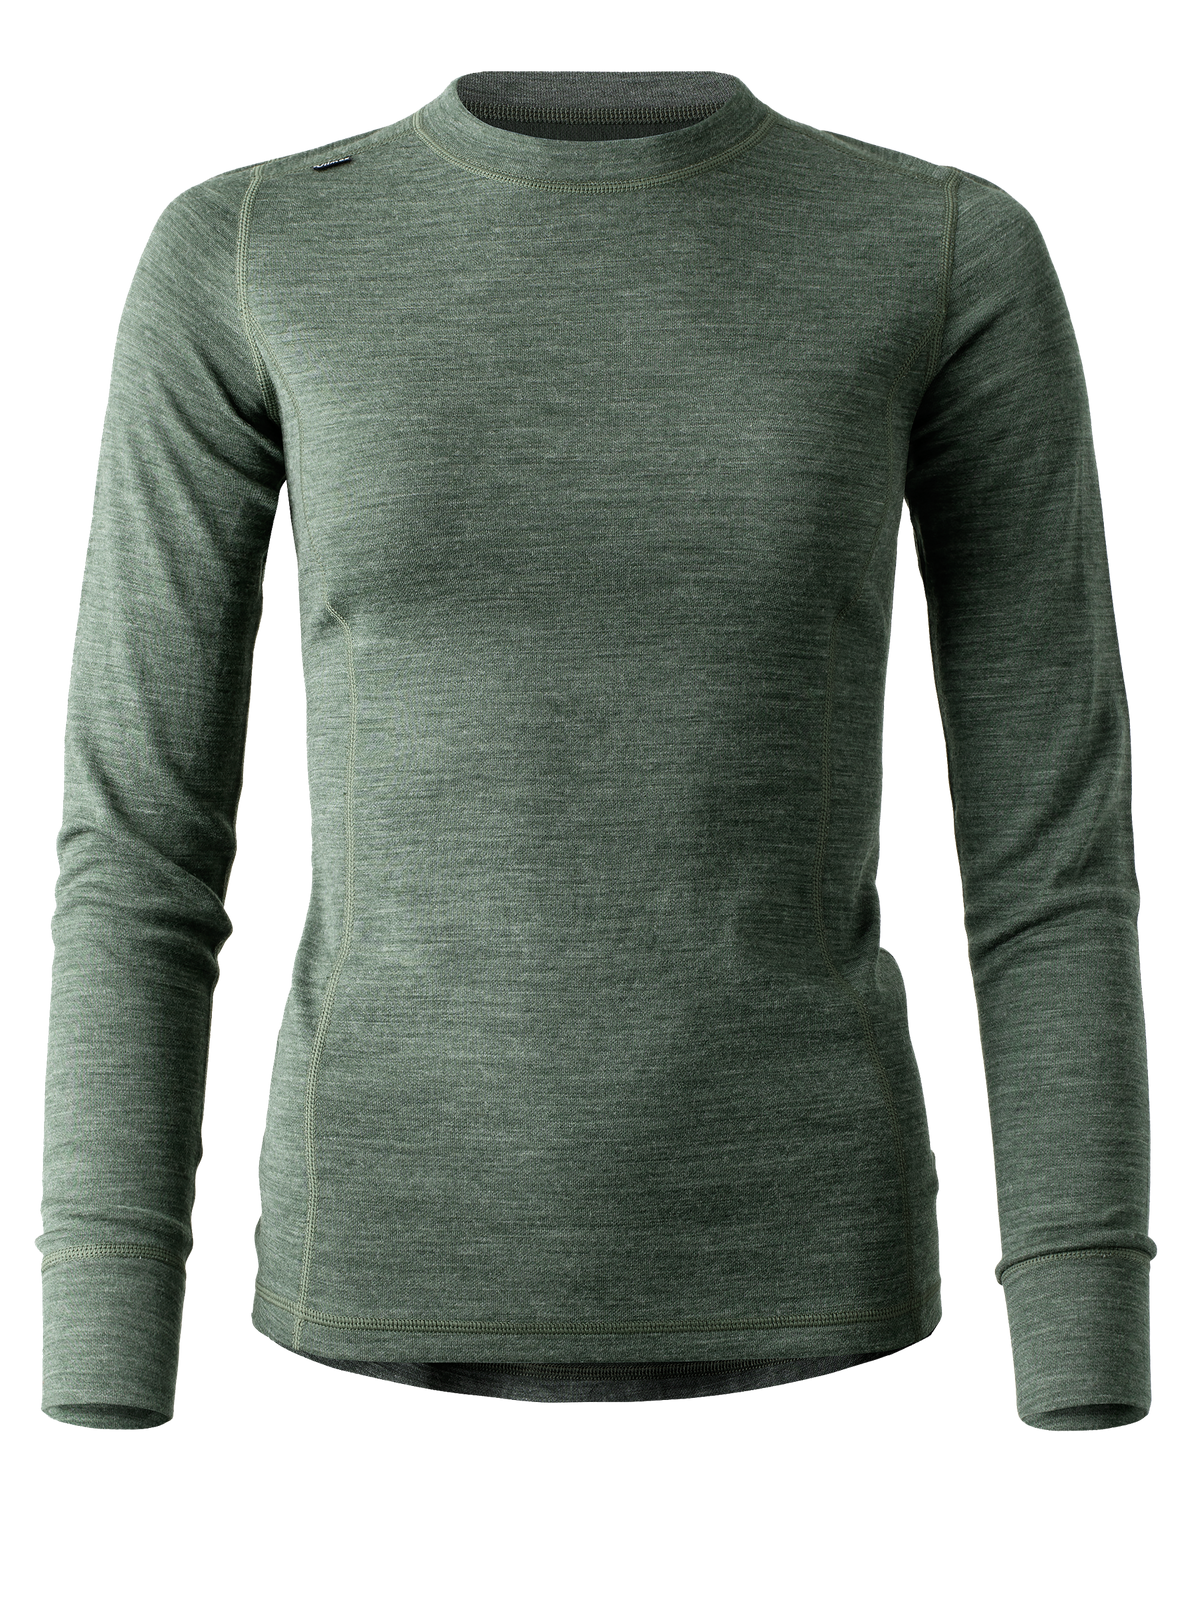 Merino Super Soft Sweater Women Grön